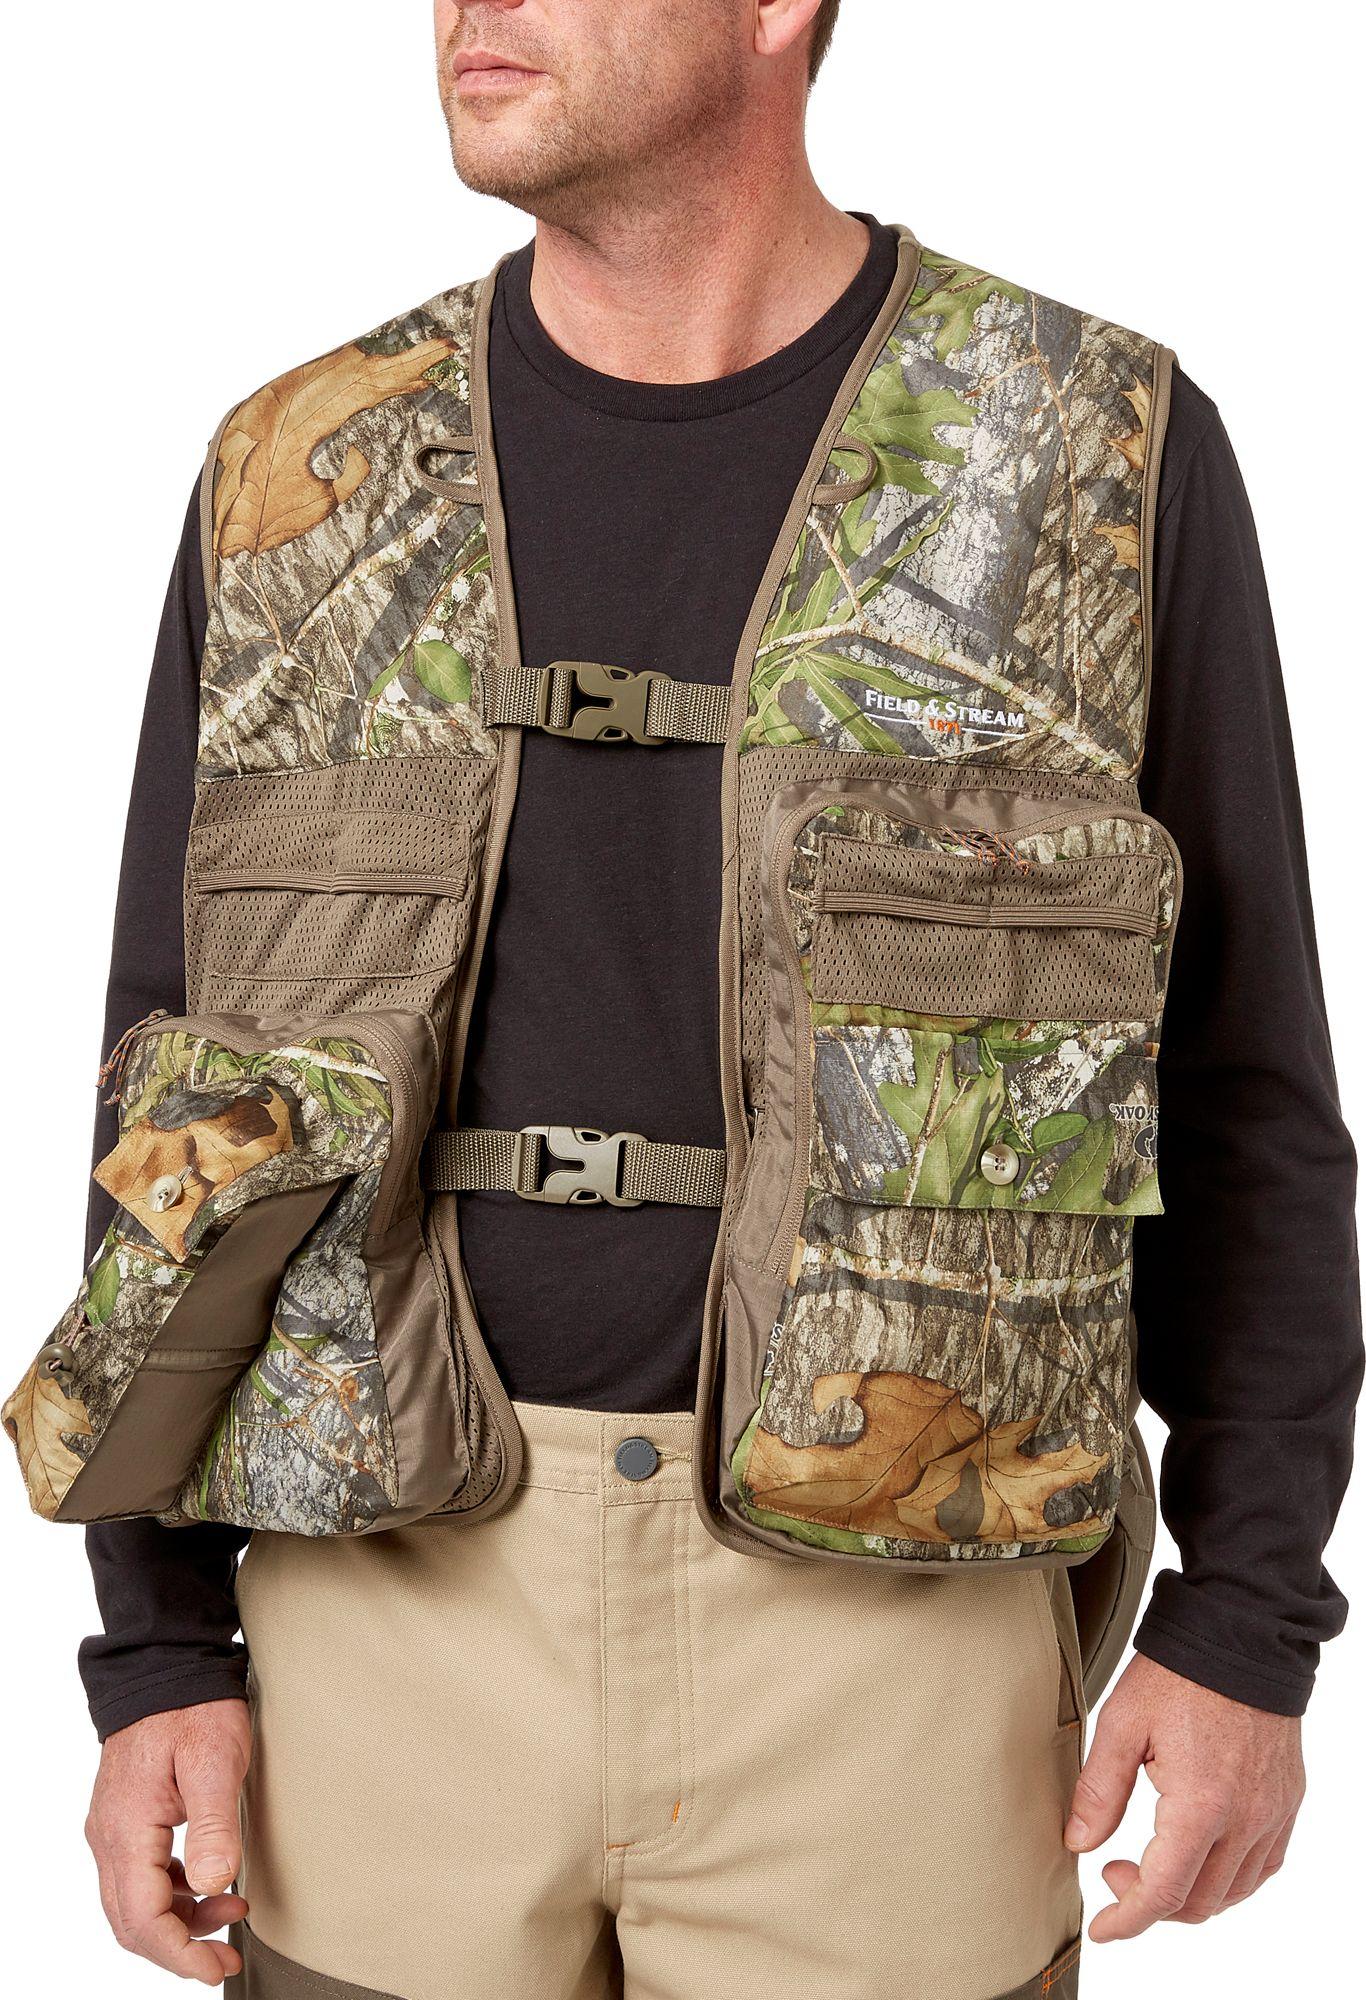 Field & Stream Every Hunt Turkey Vest, Men's, Medium/Large, Green